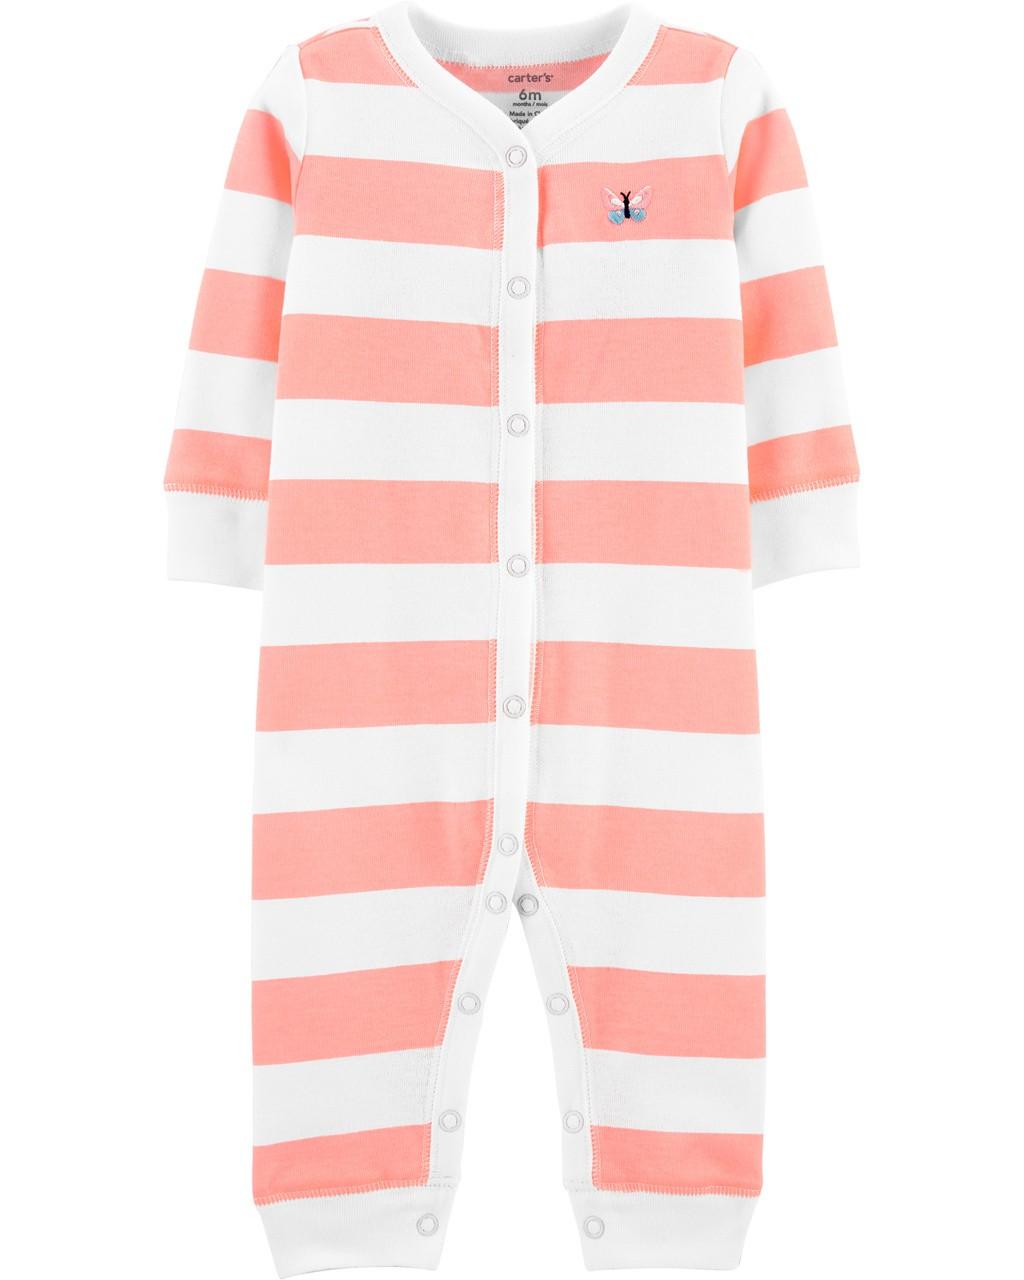 Pijama listrado Borboleta Carters